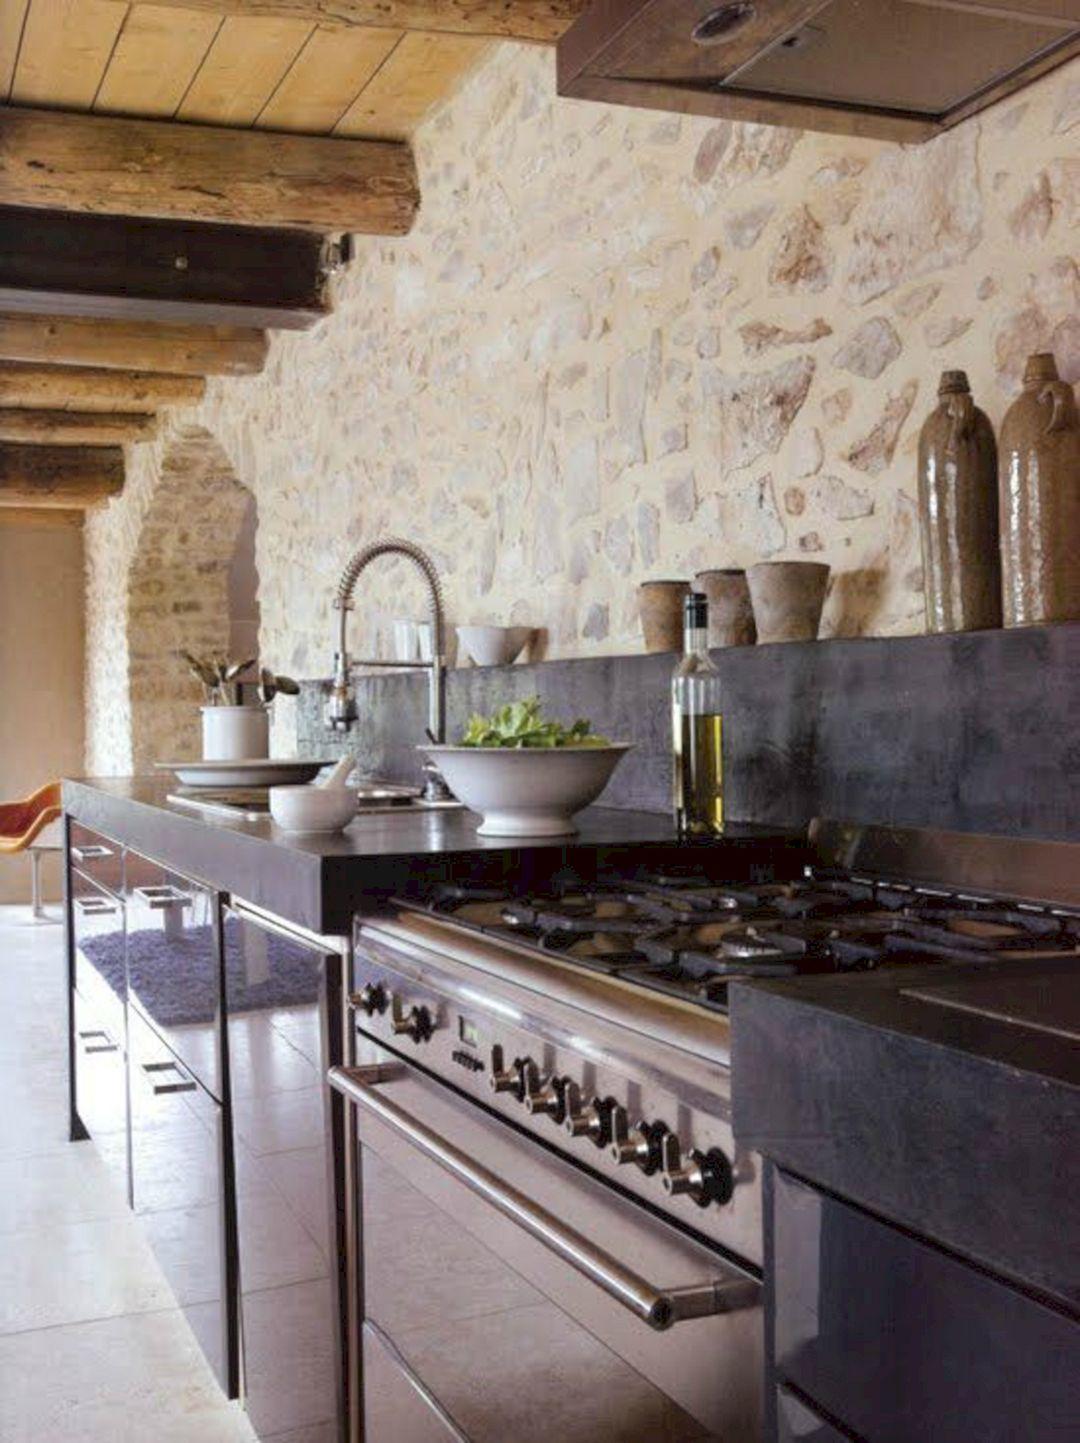 Kitchen Rustic Stone Wall (Kitchen Rustic Stone Wall ...